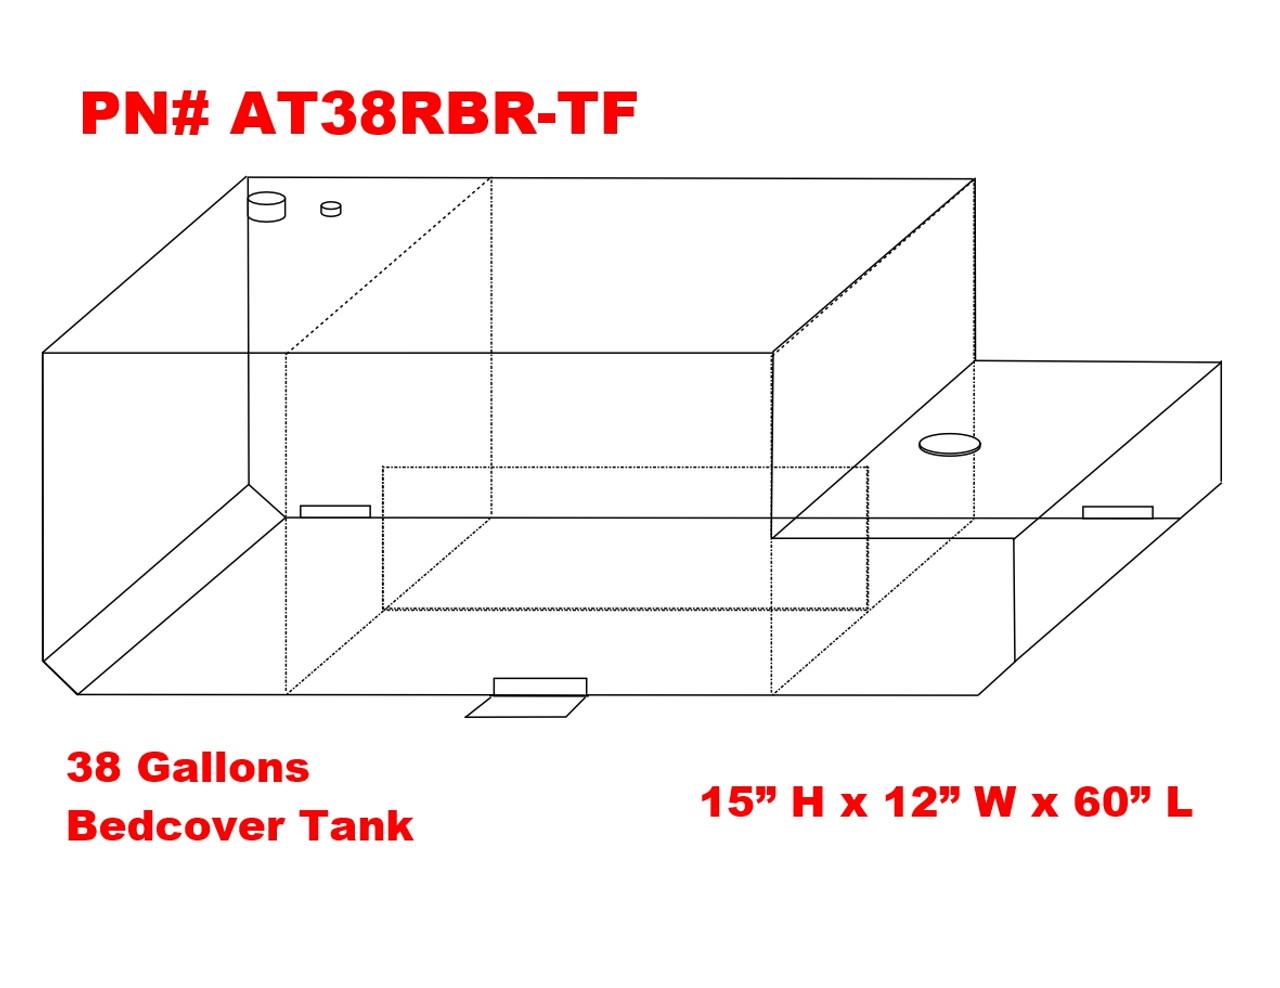 medium resolution of at38rbr tf dot legal transfer tank pn at38rbr tf 38 gallon